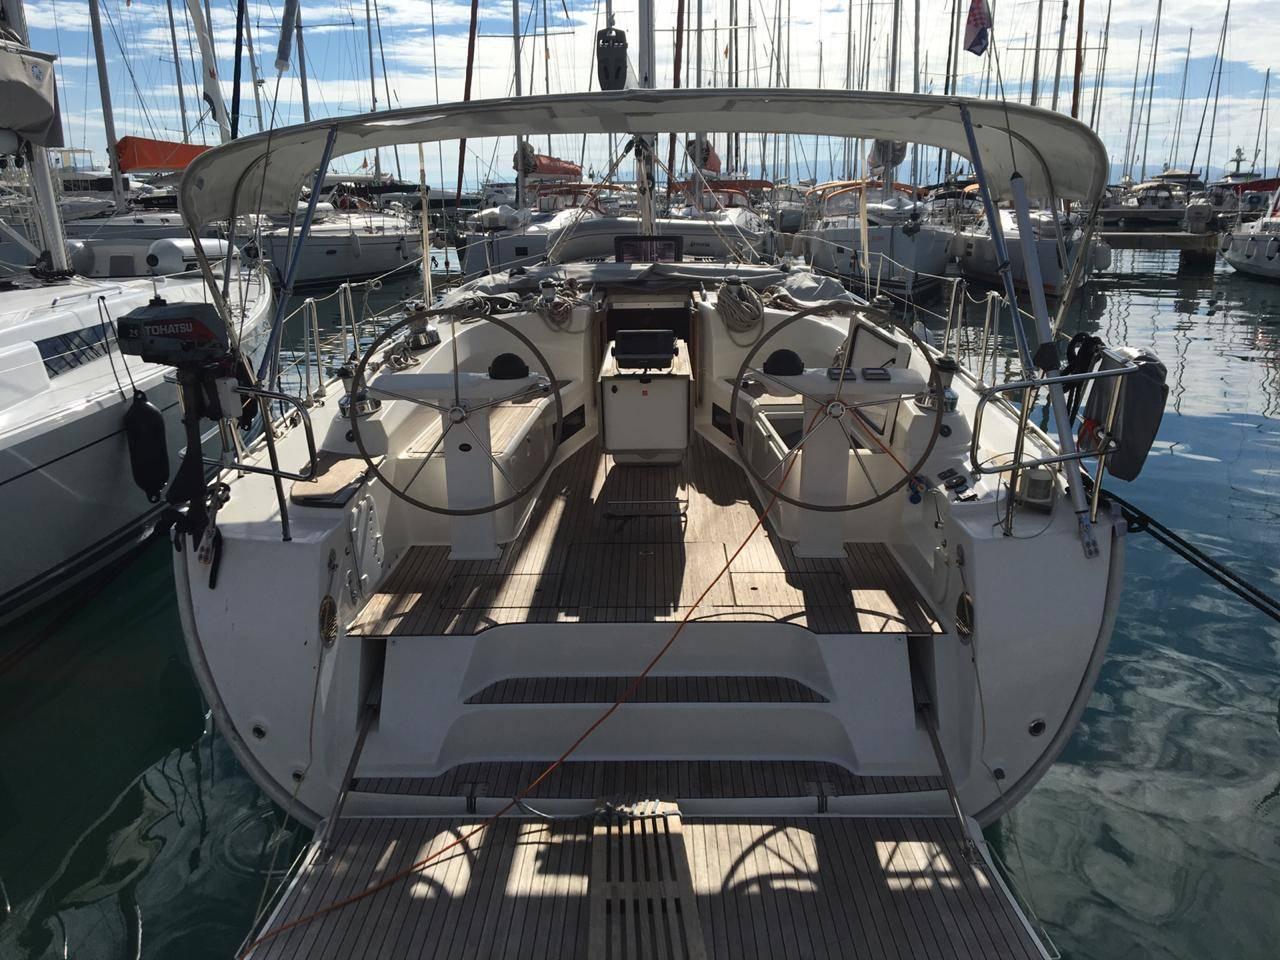 Bavaria Cruiser 45, Takeo